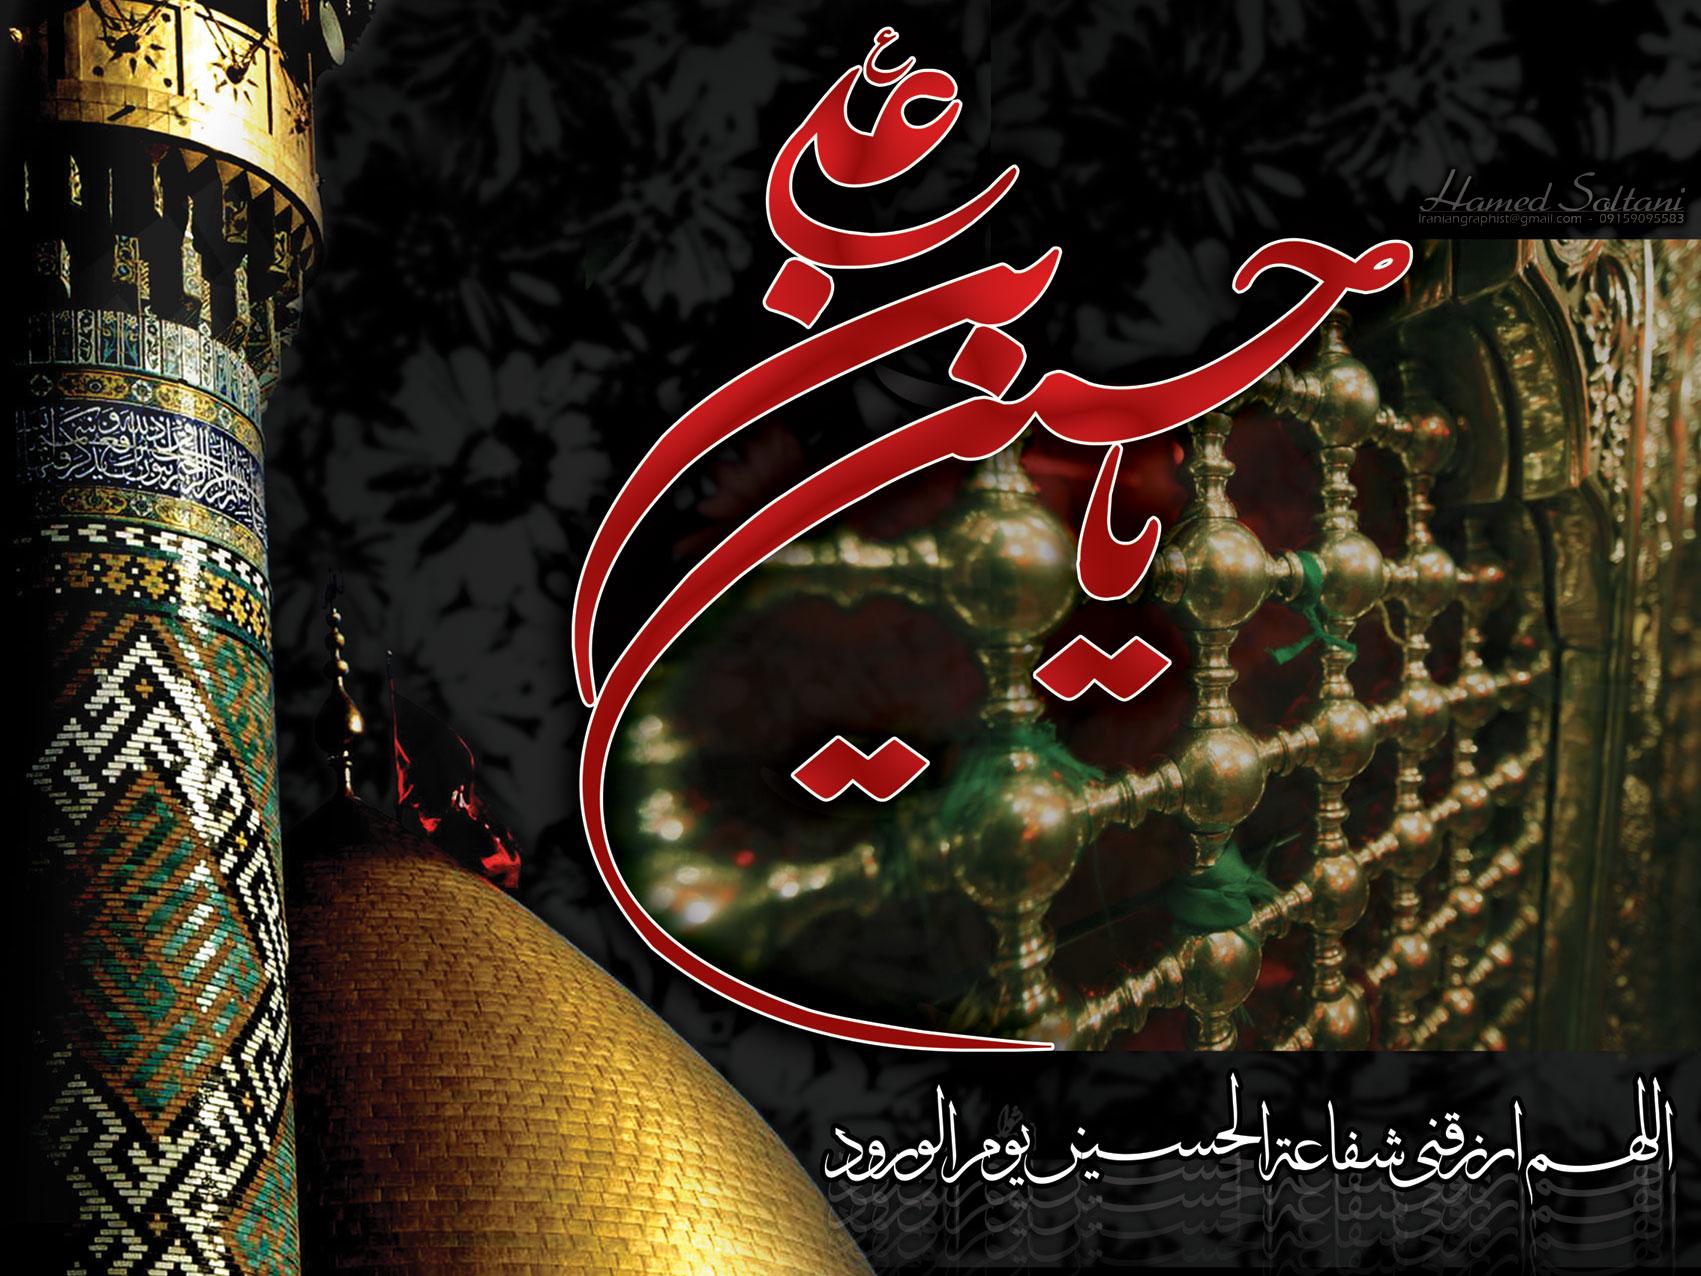 http://hamedagha.persiangig.com/image/imam%20hossein/60~45.jpg